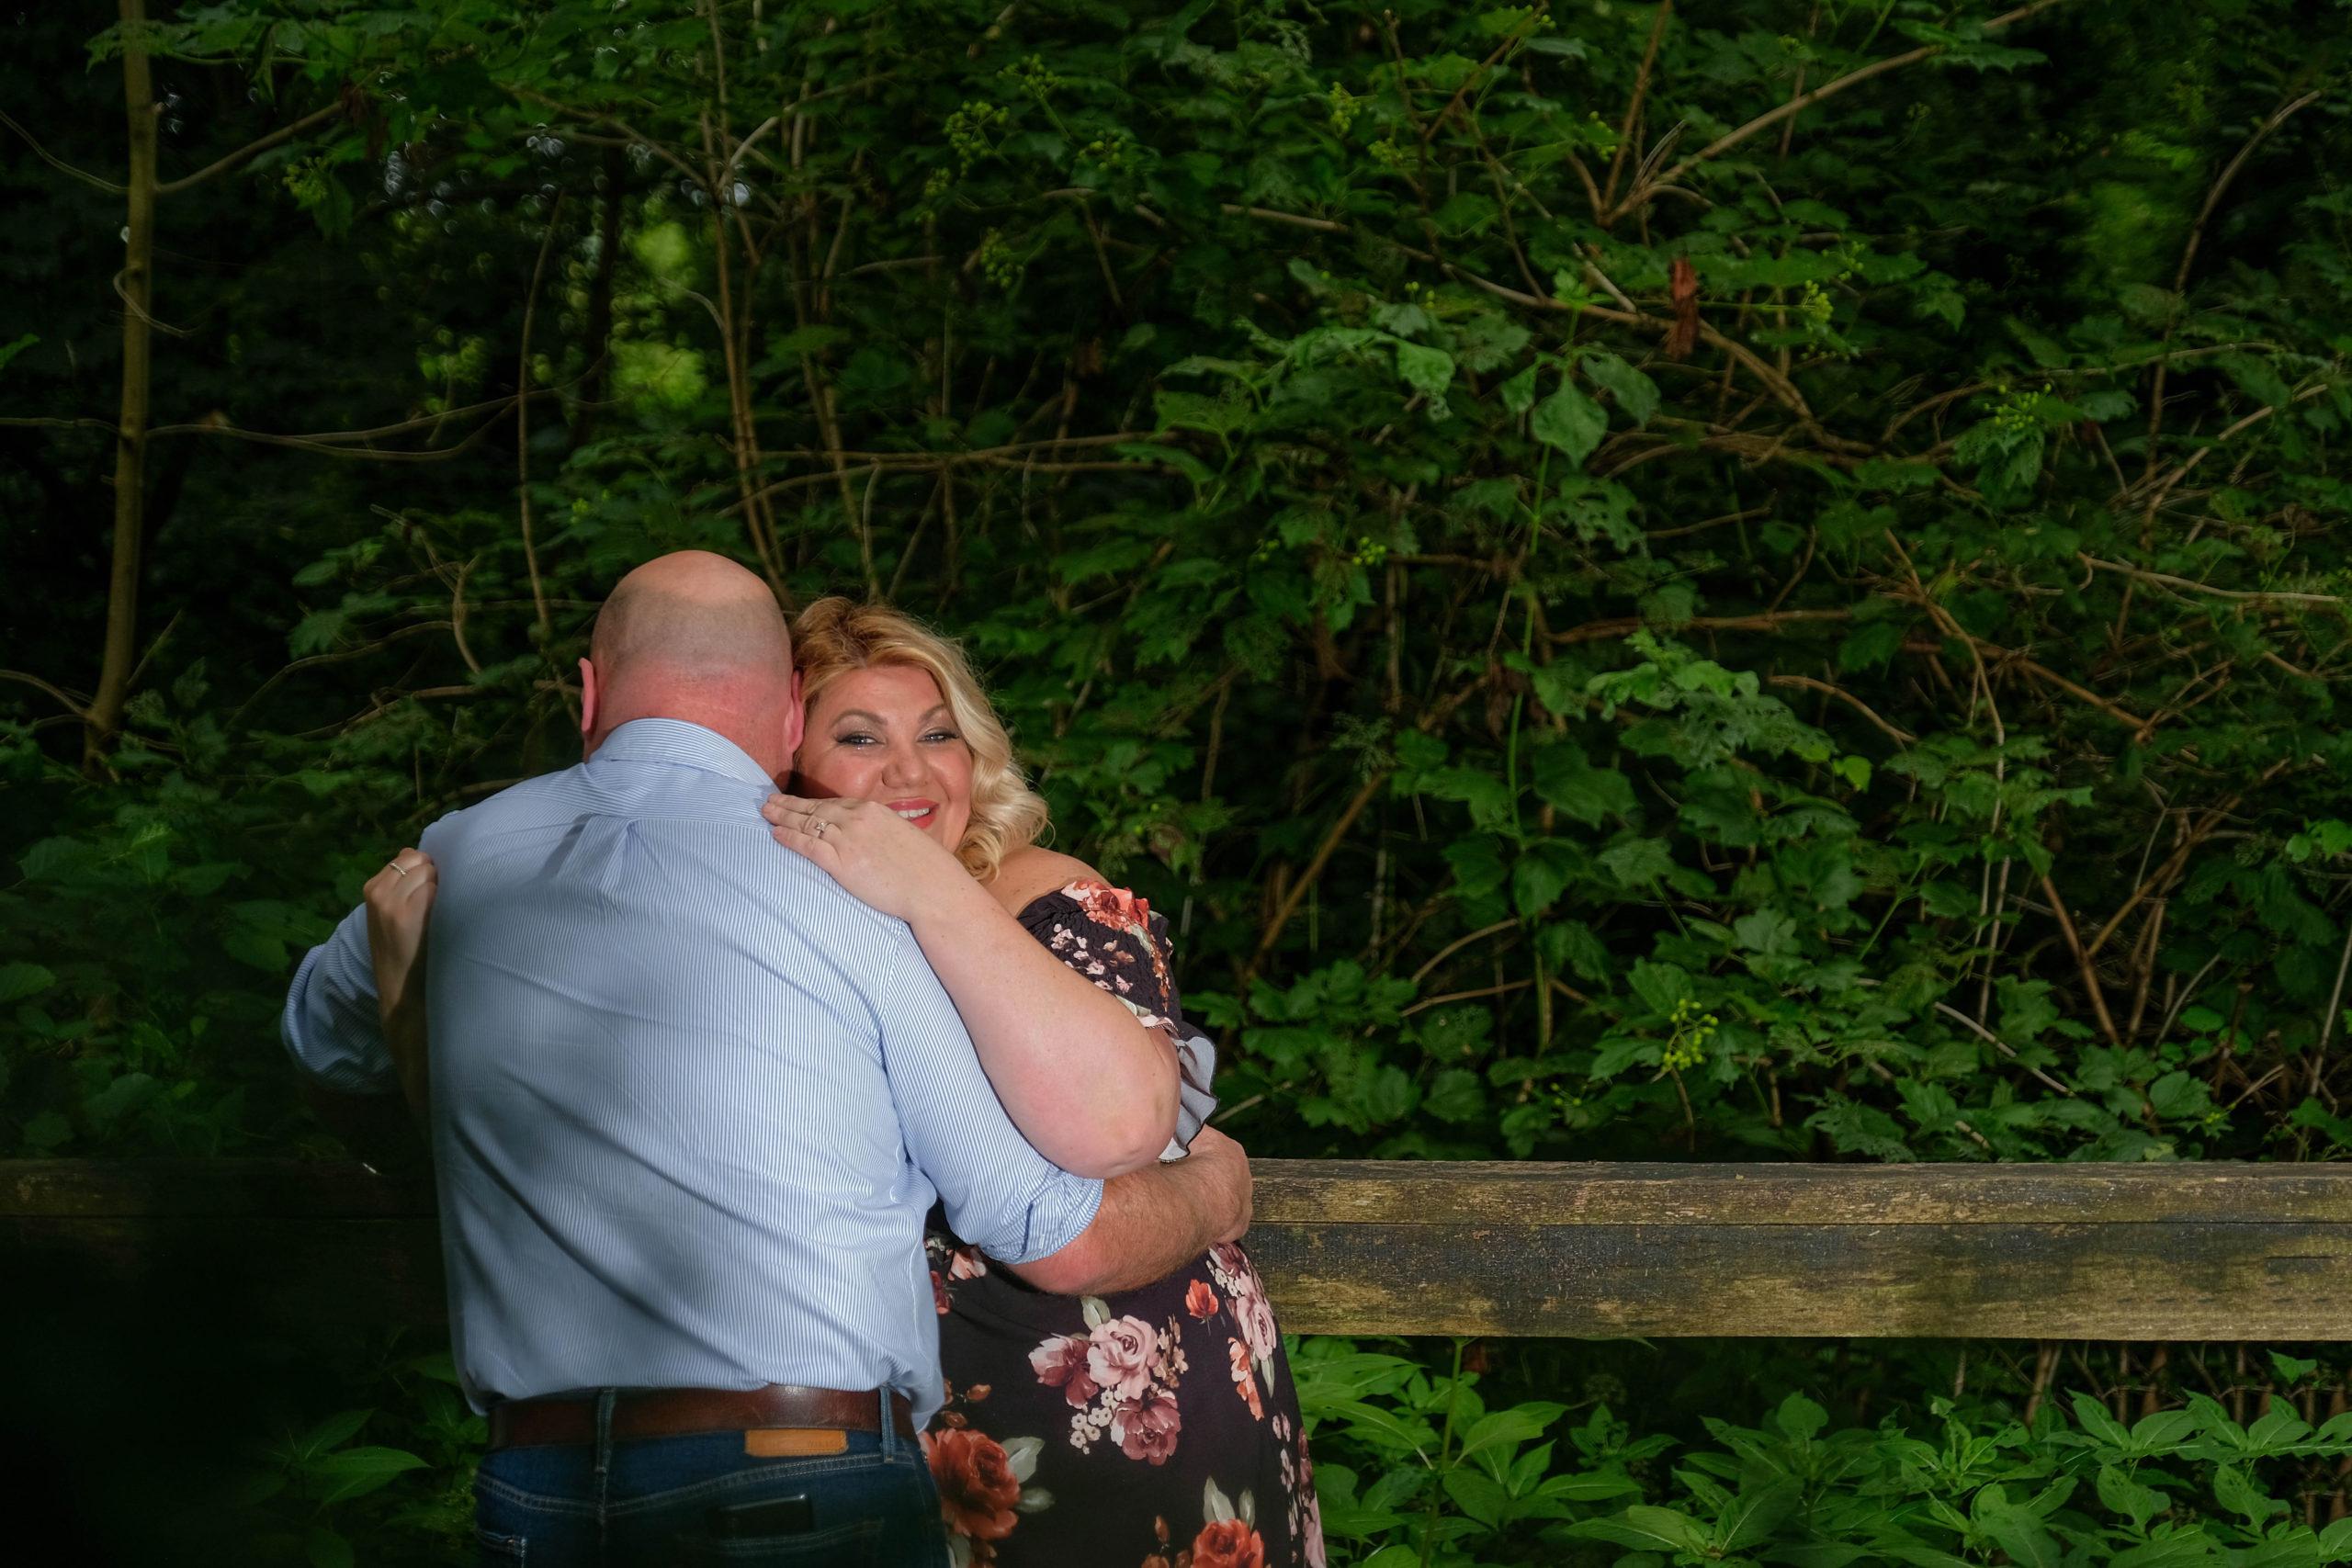 Cwmbran wedding photographer pre-wedding photoshoot